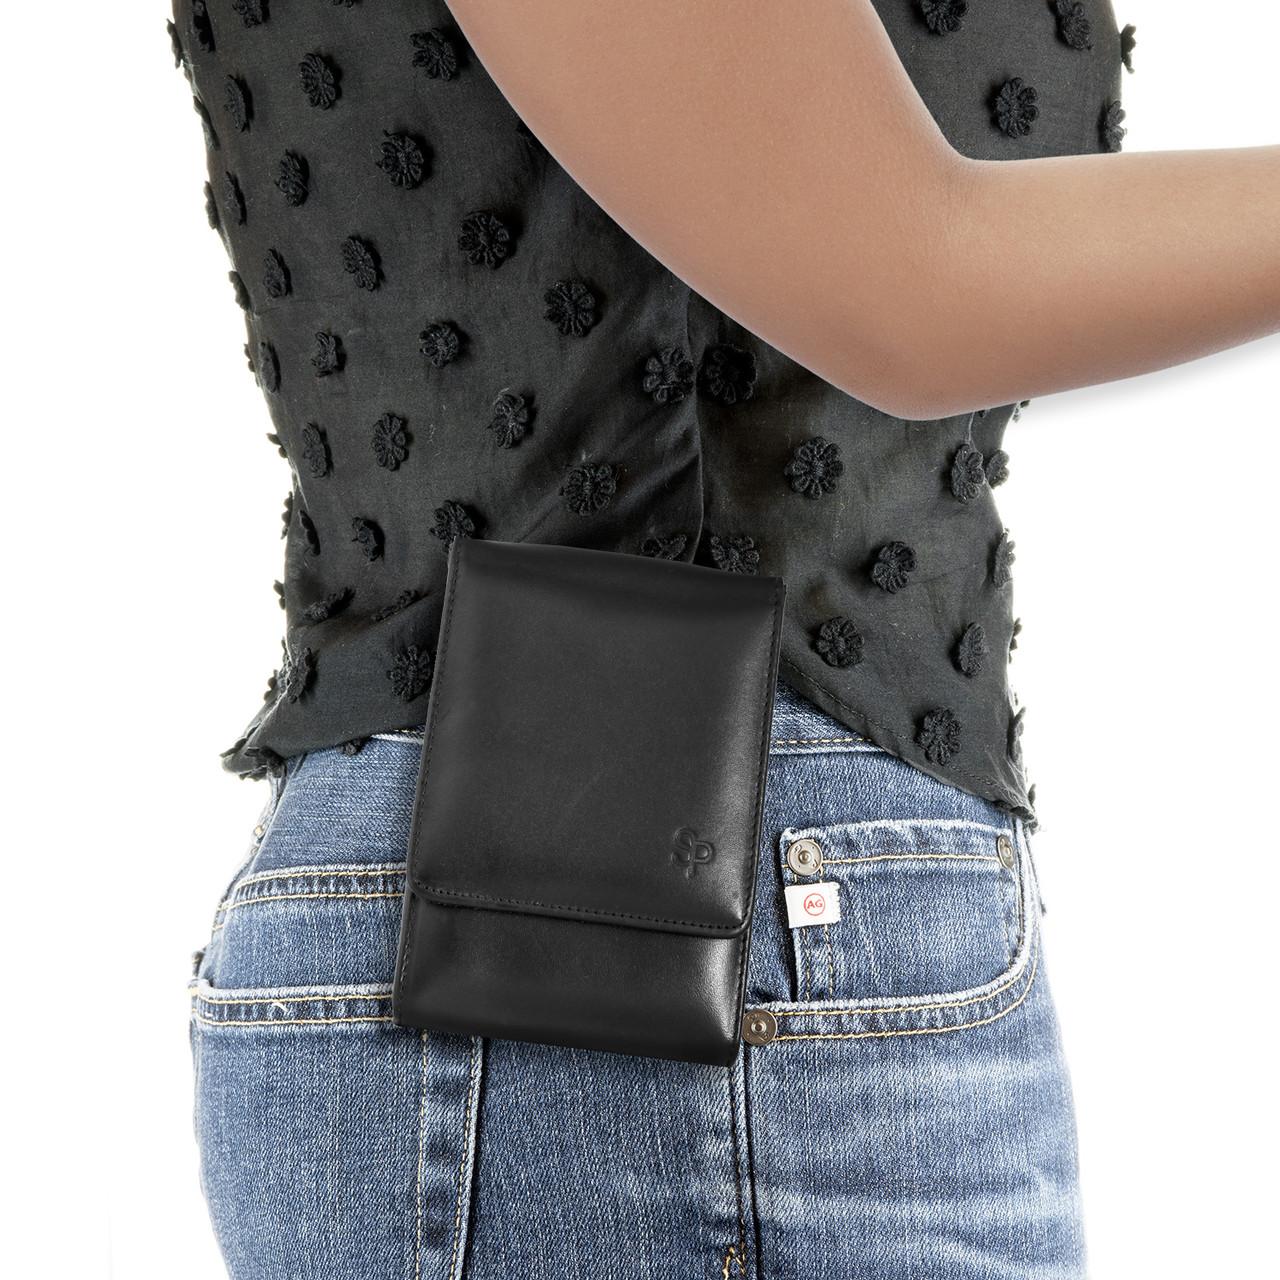 Shield EZ 9mm Black Leather Holster